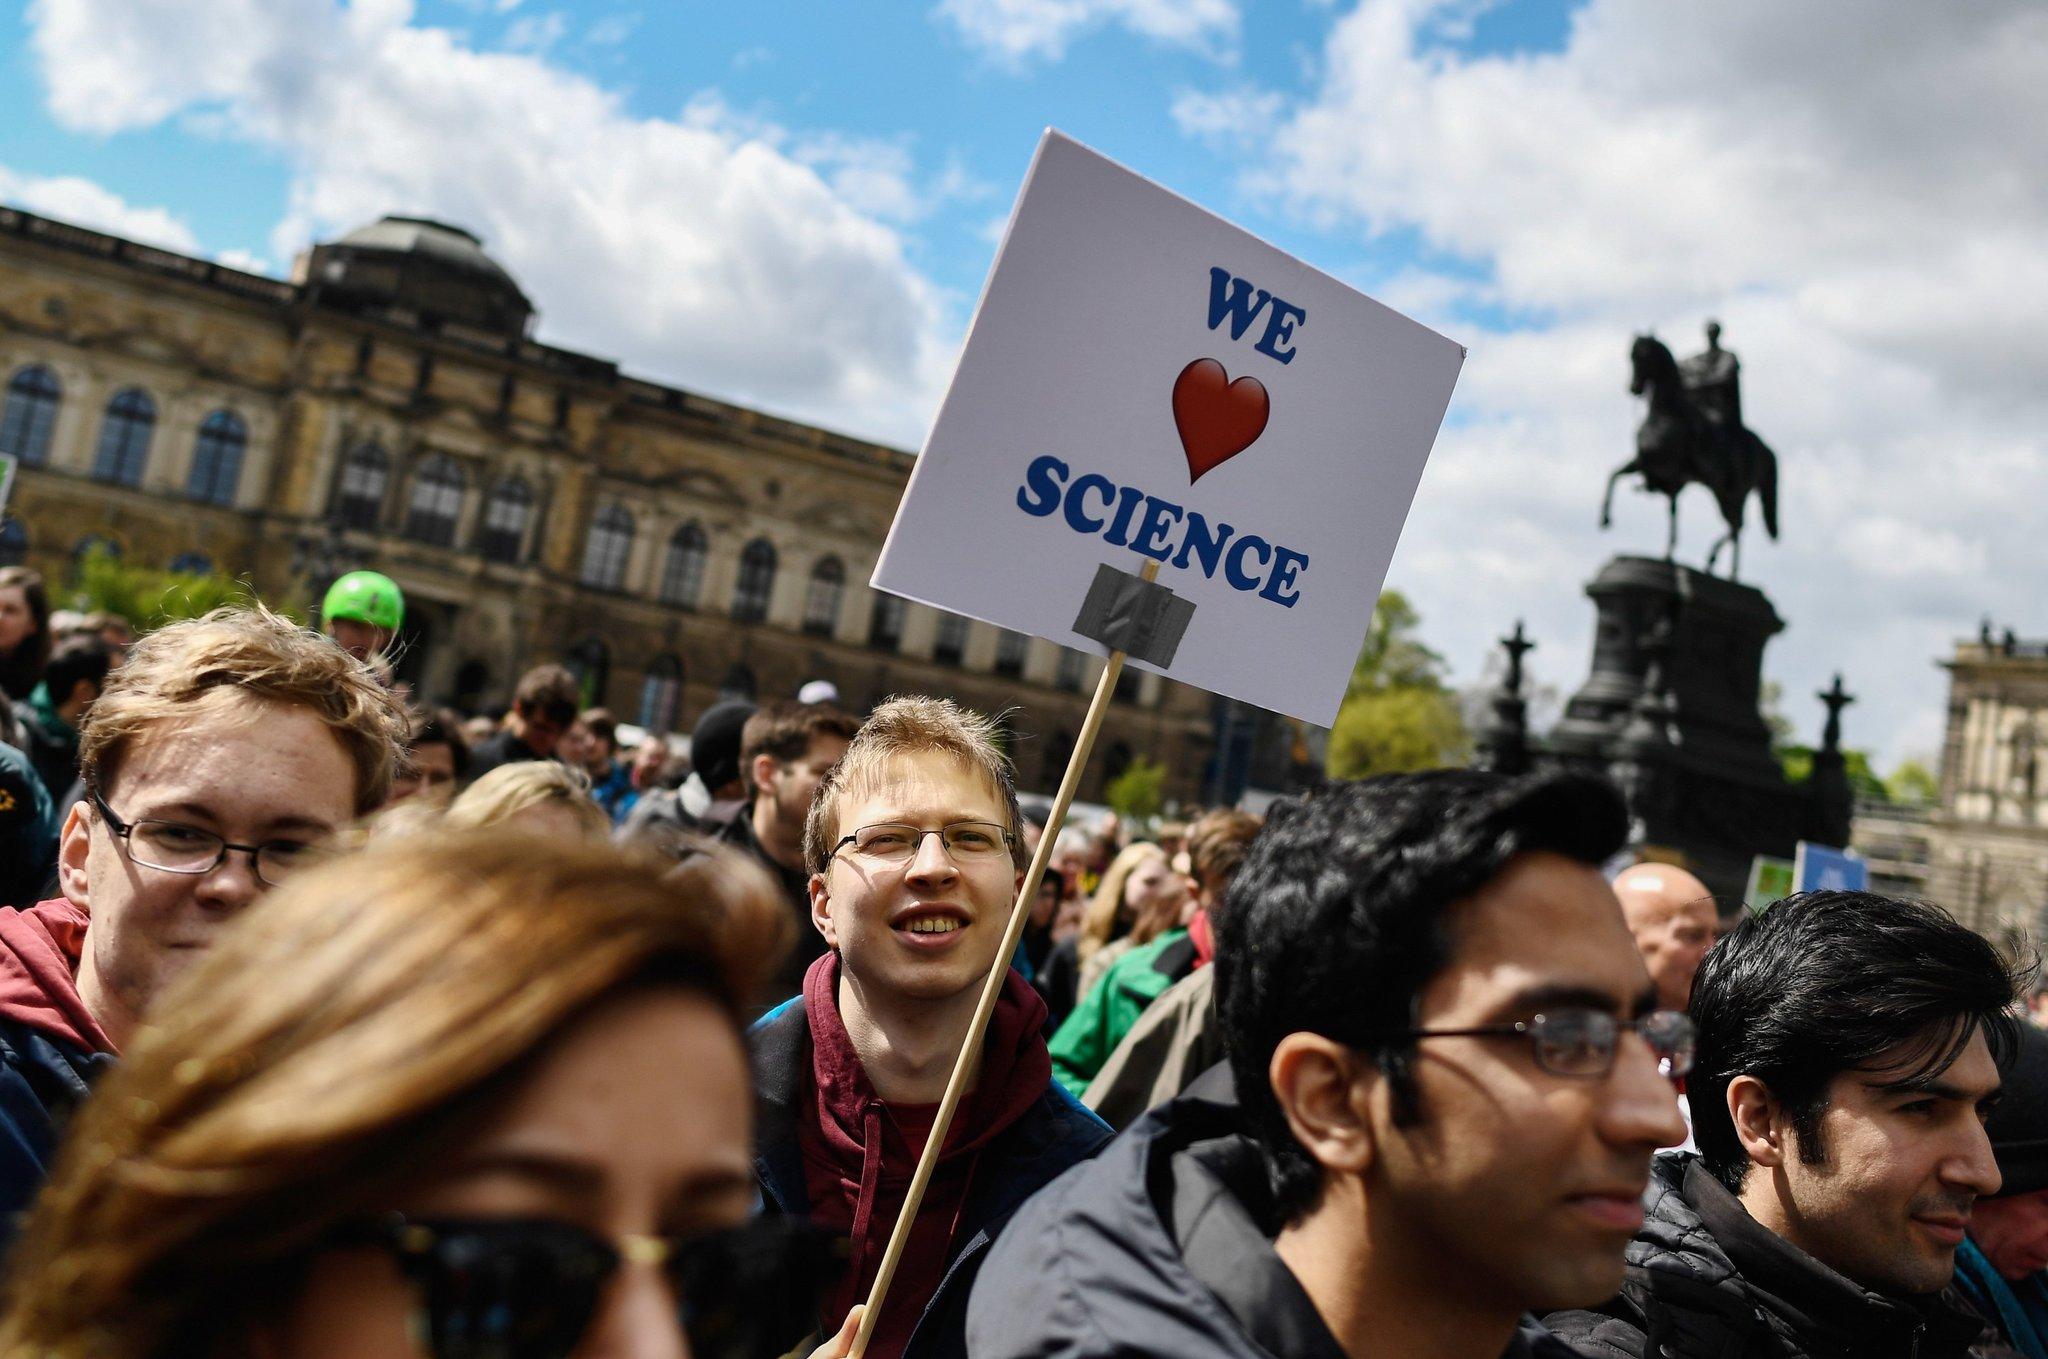 День Земли 2017 – Марш во имя Науки